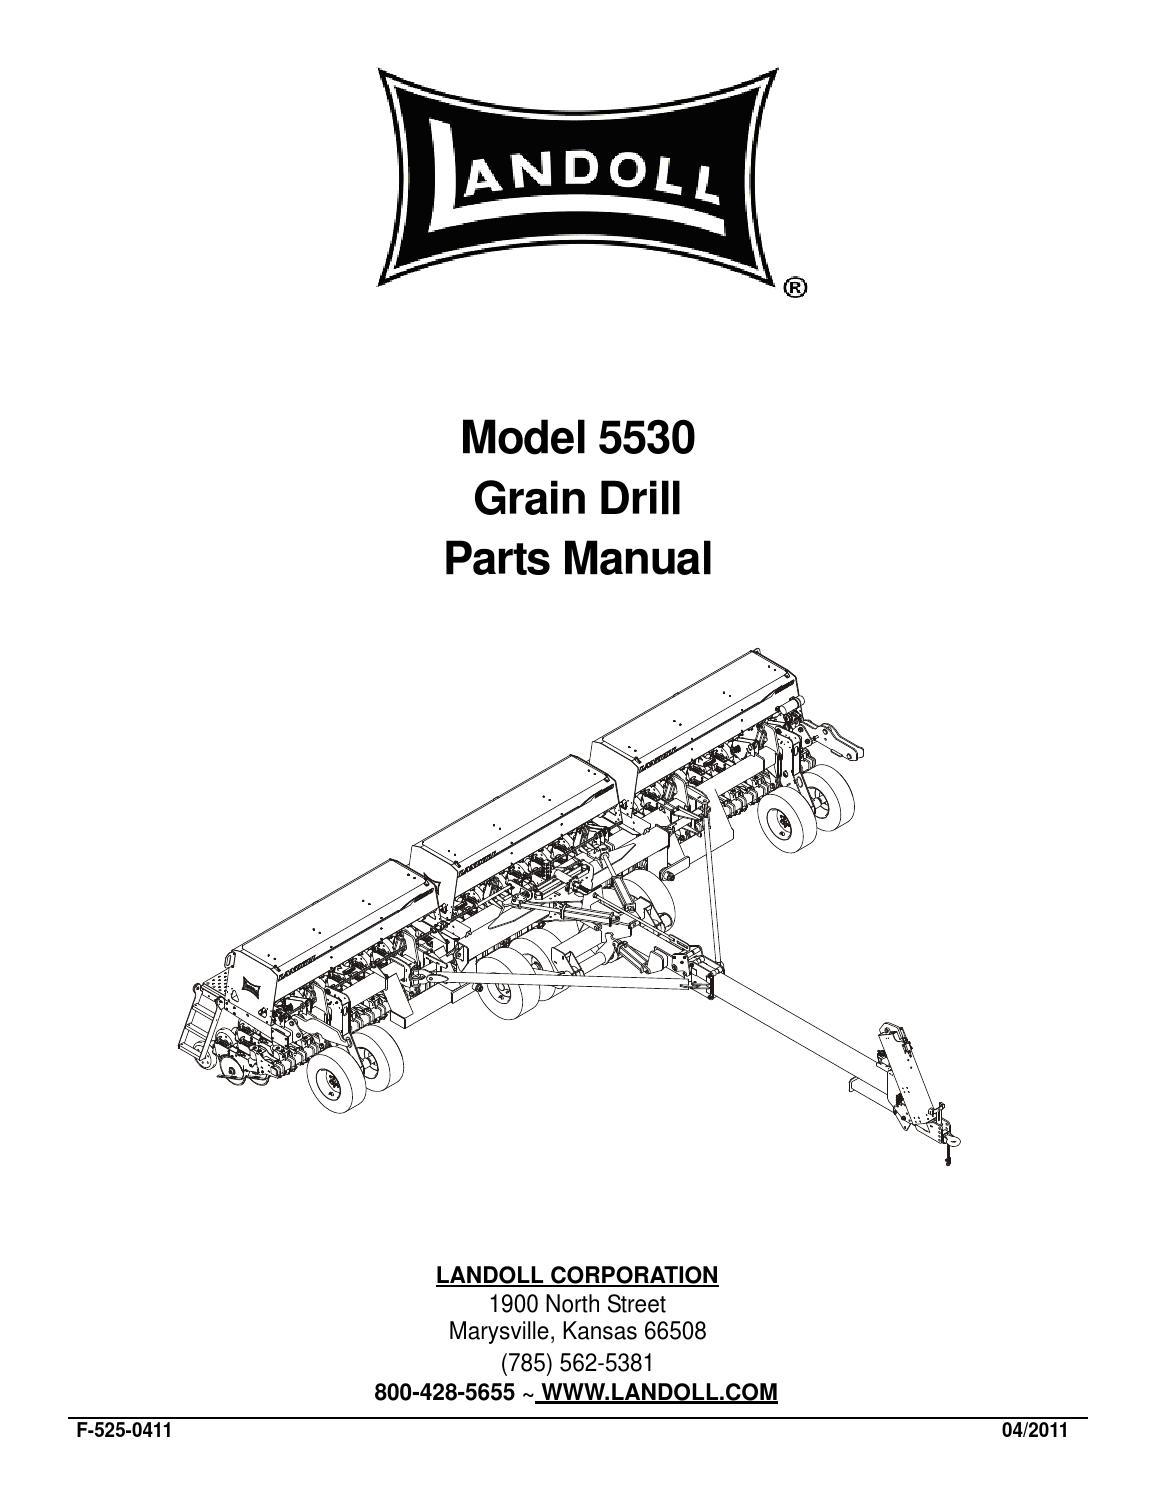 5530 30 40 grain drill parts manual f 525 0411 by anton